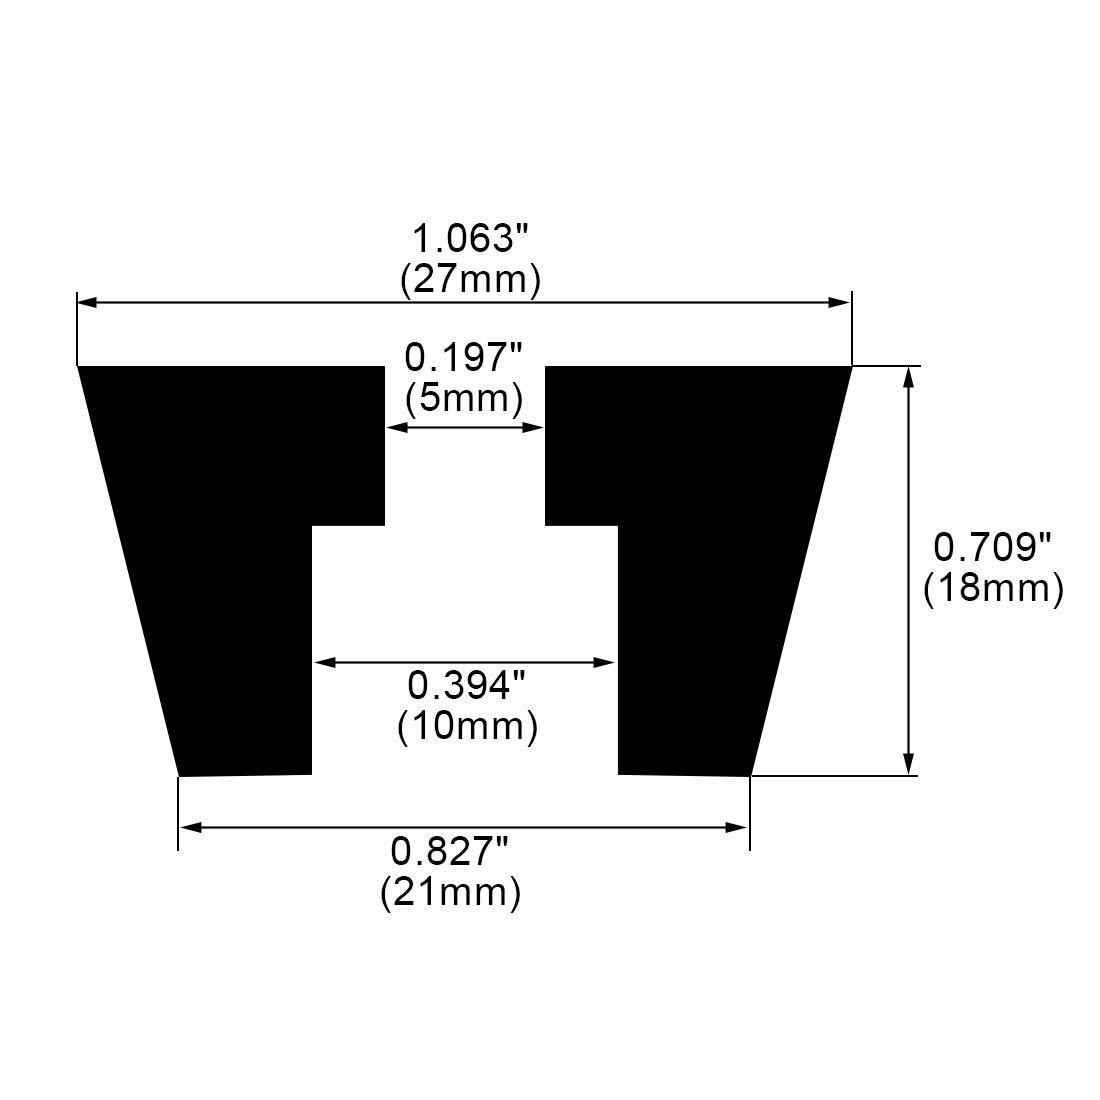 D47x32xH29mm uxcell 5pcs Rubber Feet Bumper Furniture Table Amplifier Speaker Floor Protector Cabinet Leg Pads